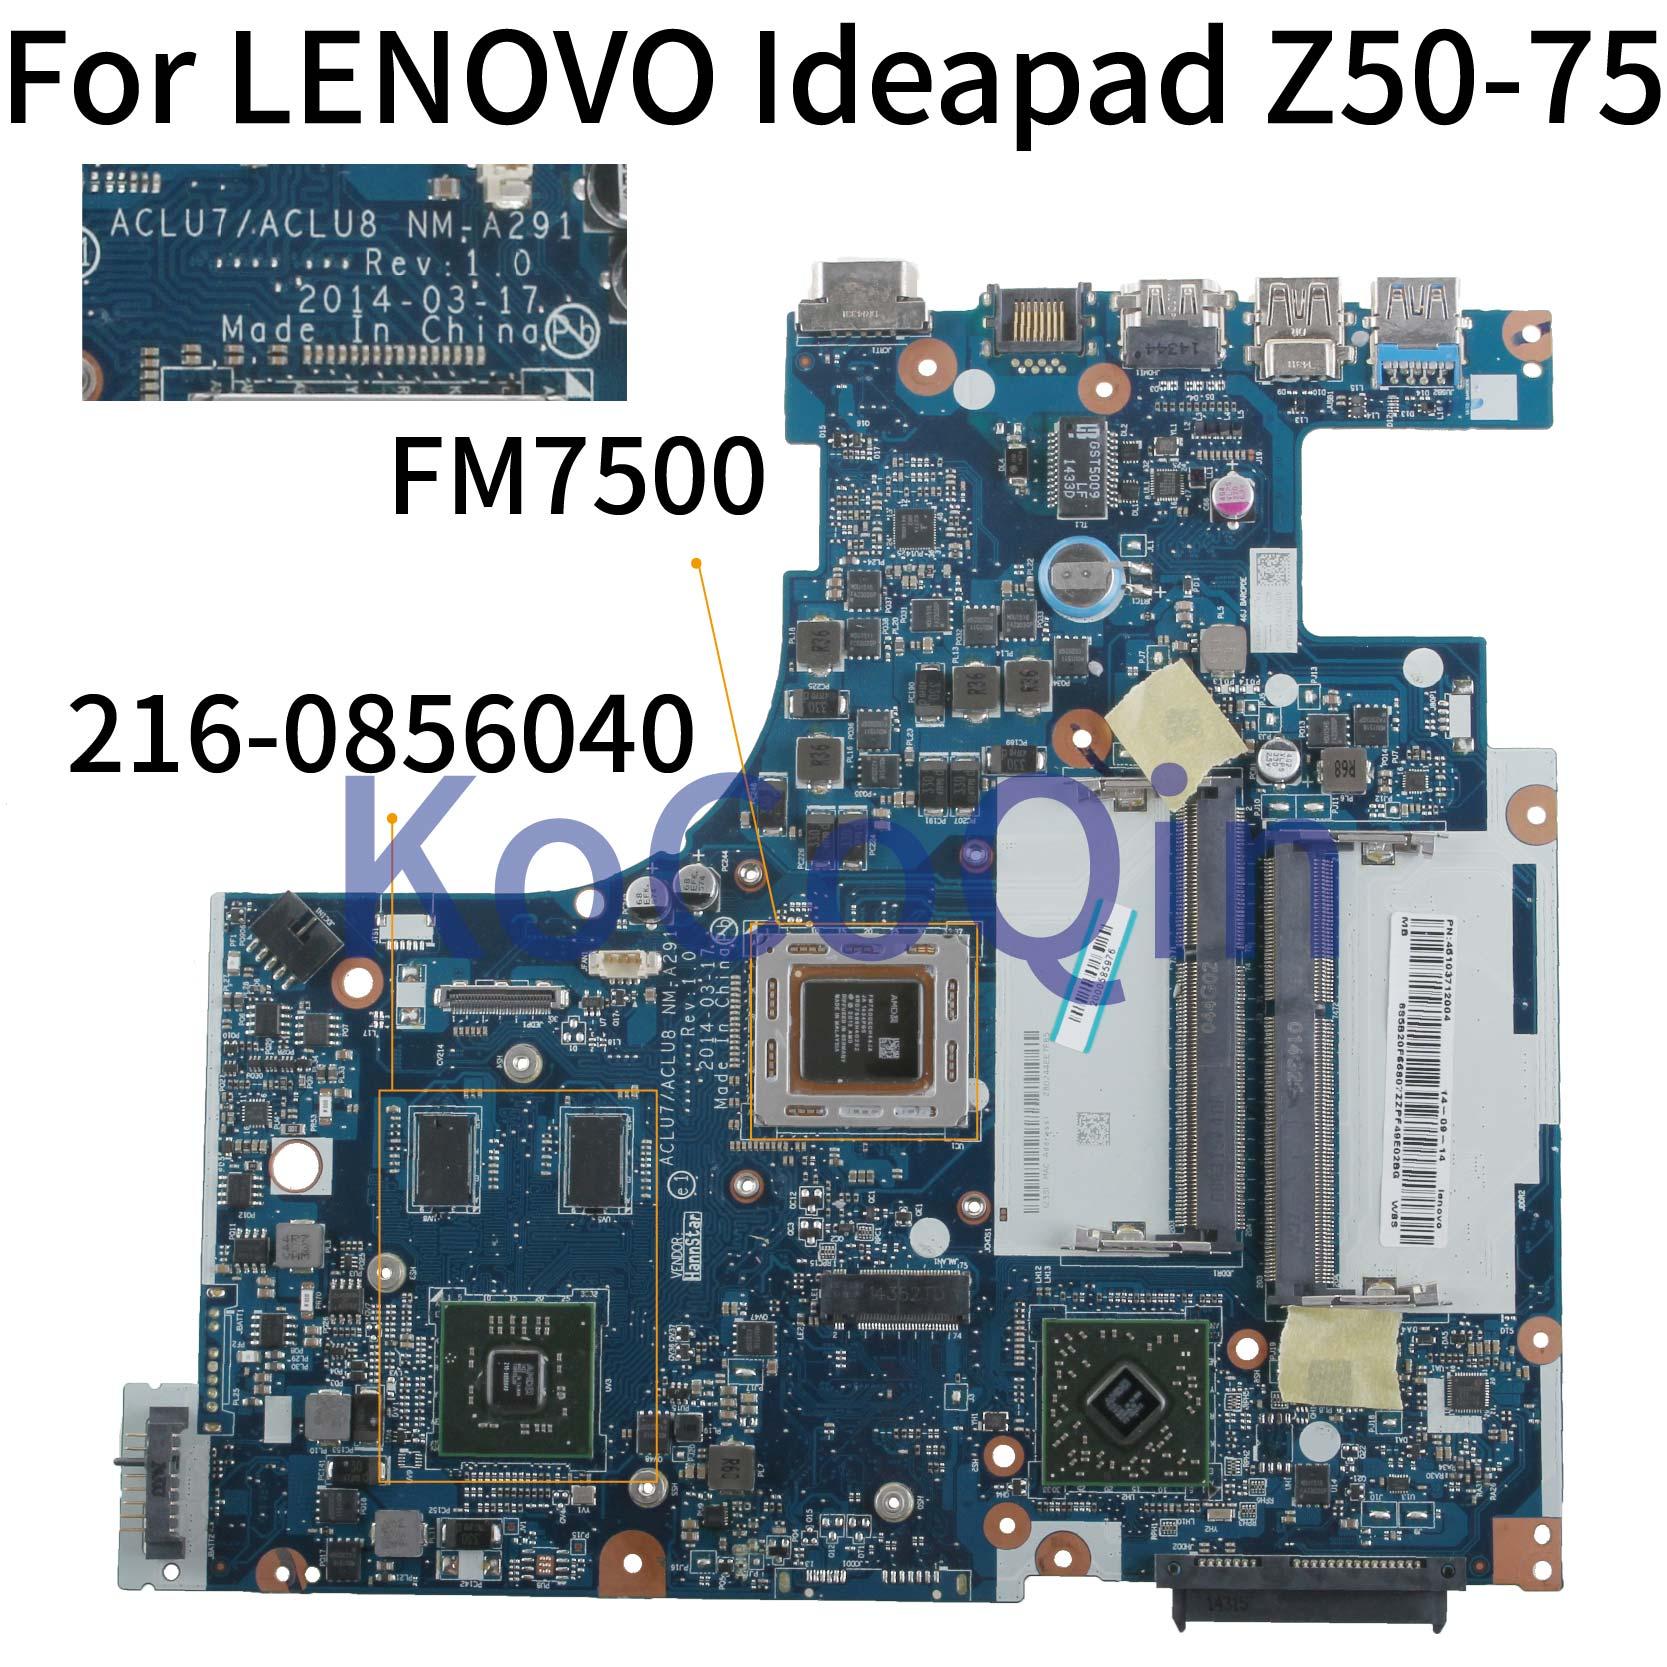 KoCoQin Laptop Motherboard For LENOVO Ideapad Z50-75 FM7500 Mainboard ACLU7 ACLU8 NM-A291 216-0856040